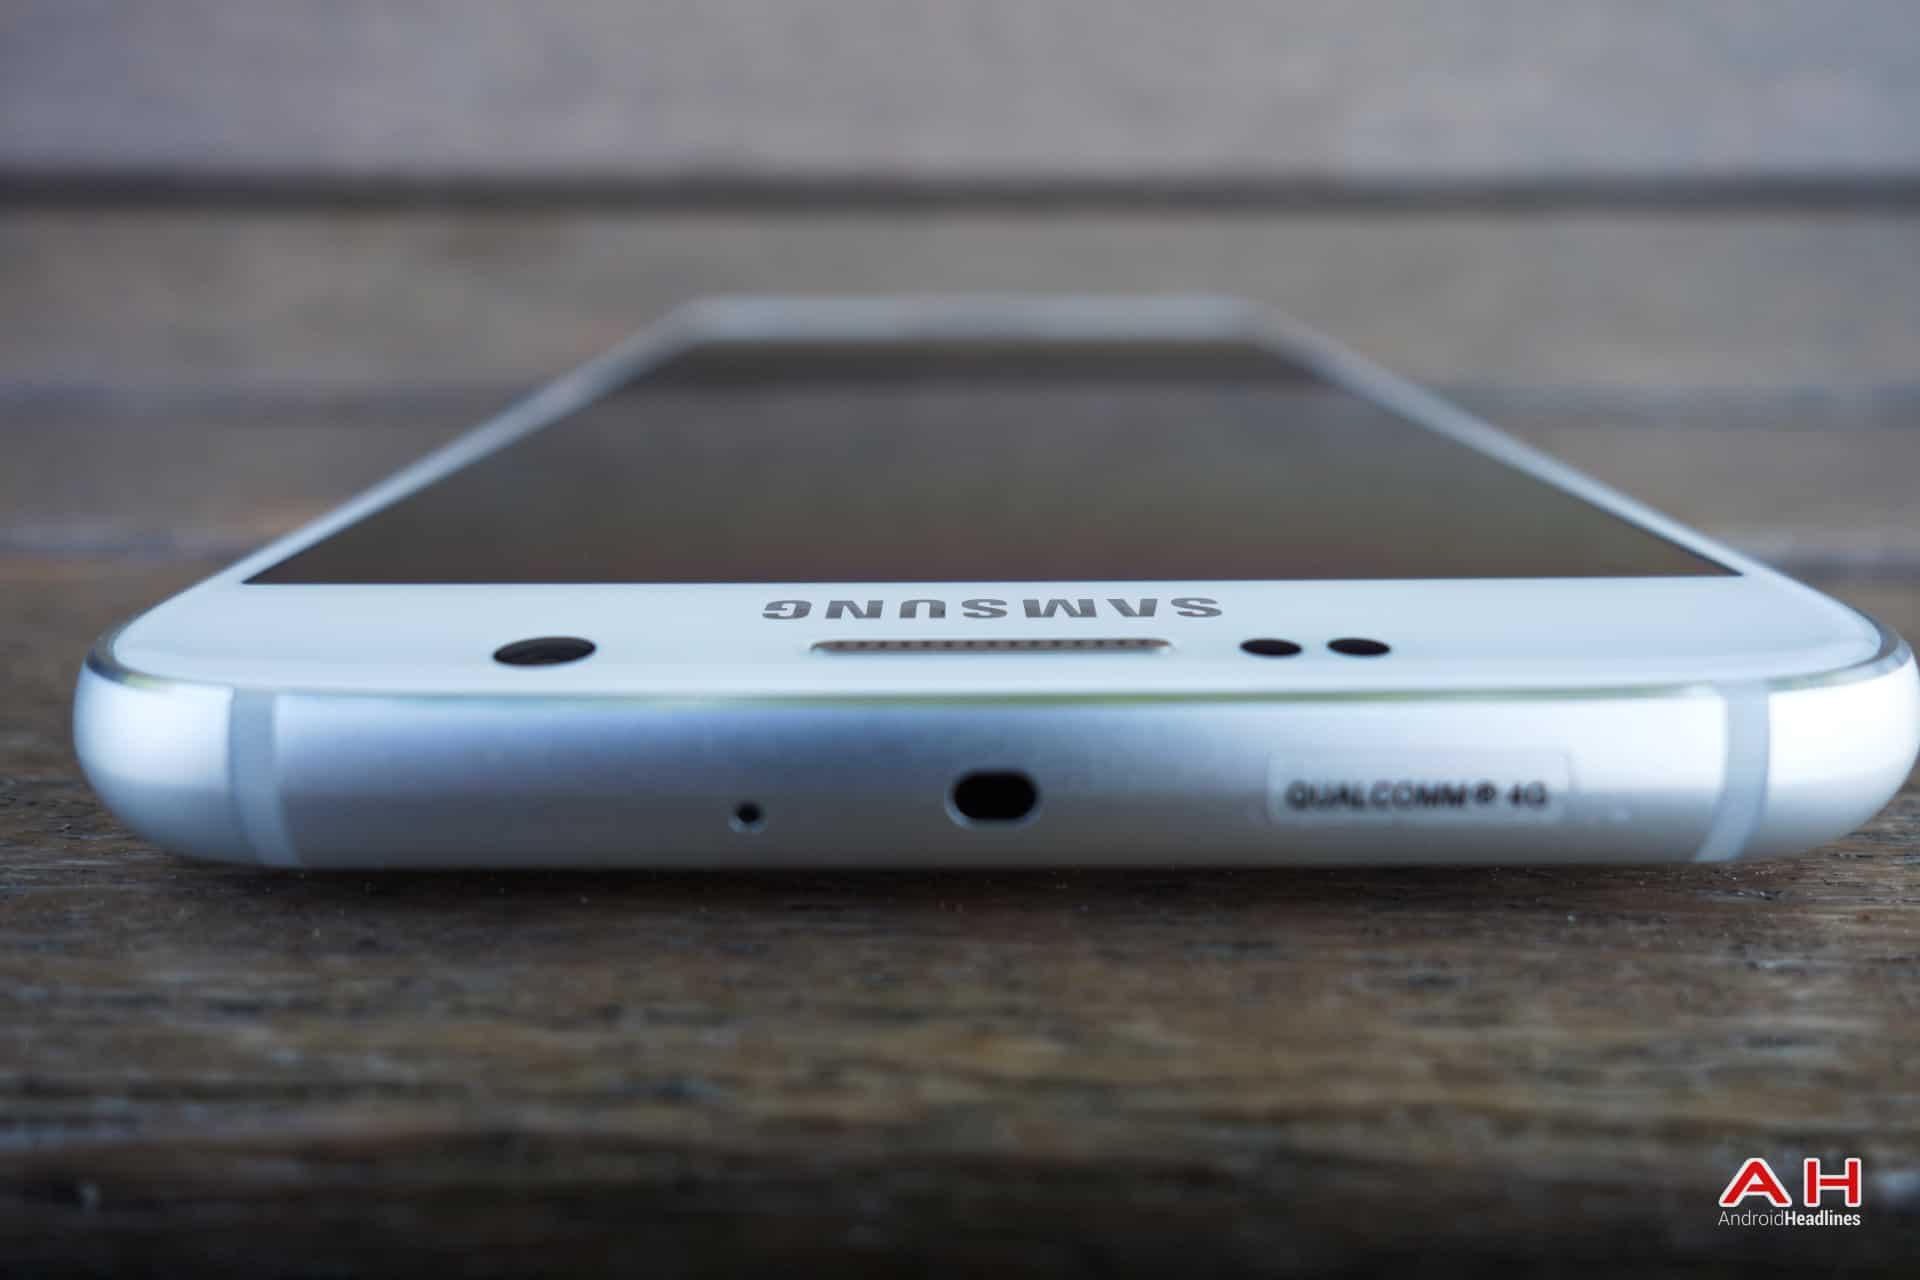 AH Samsung Galaxy S6 8